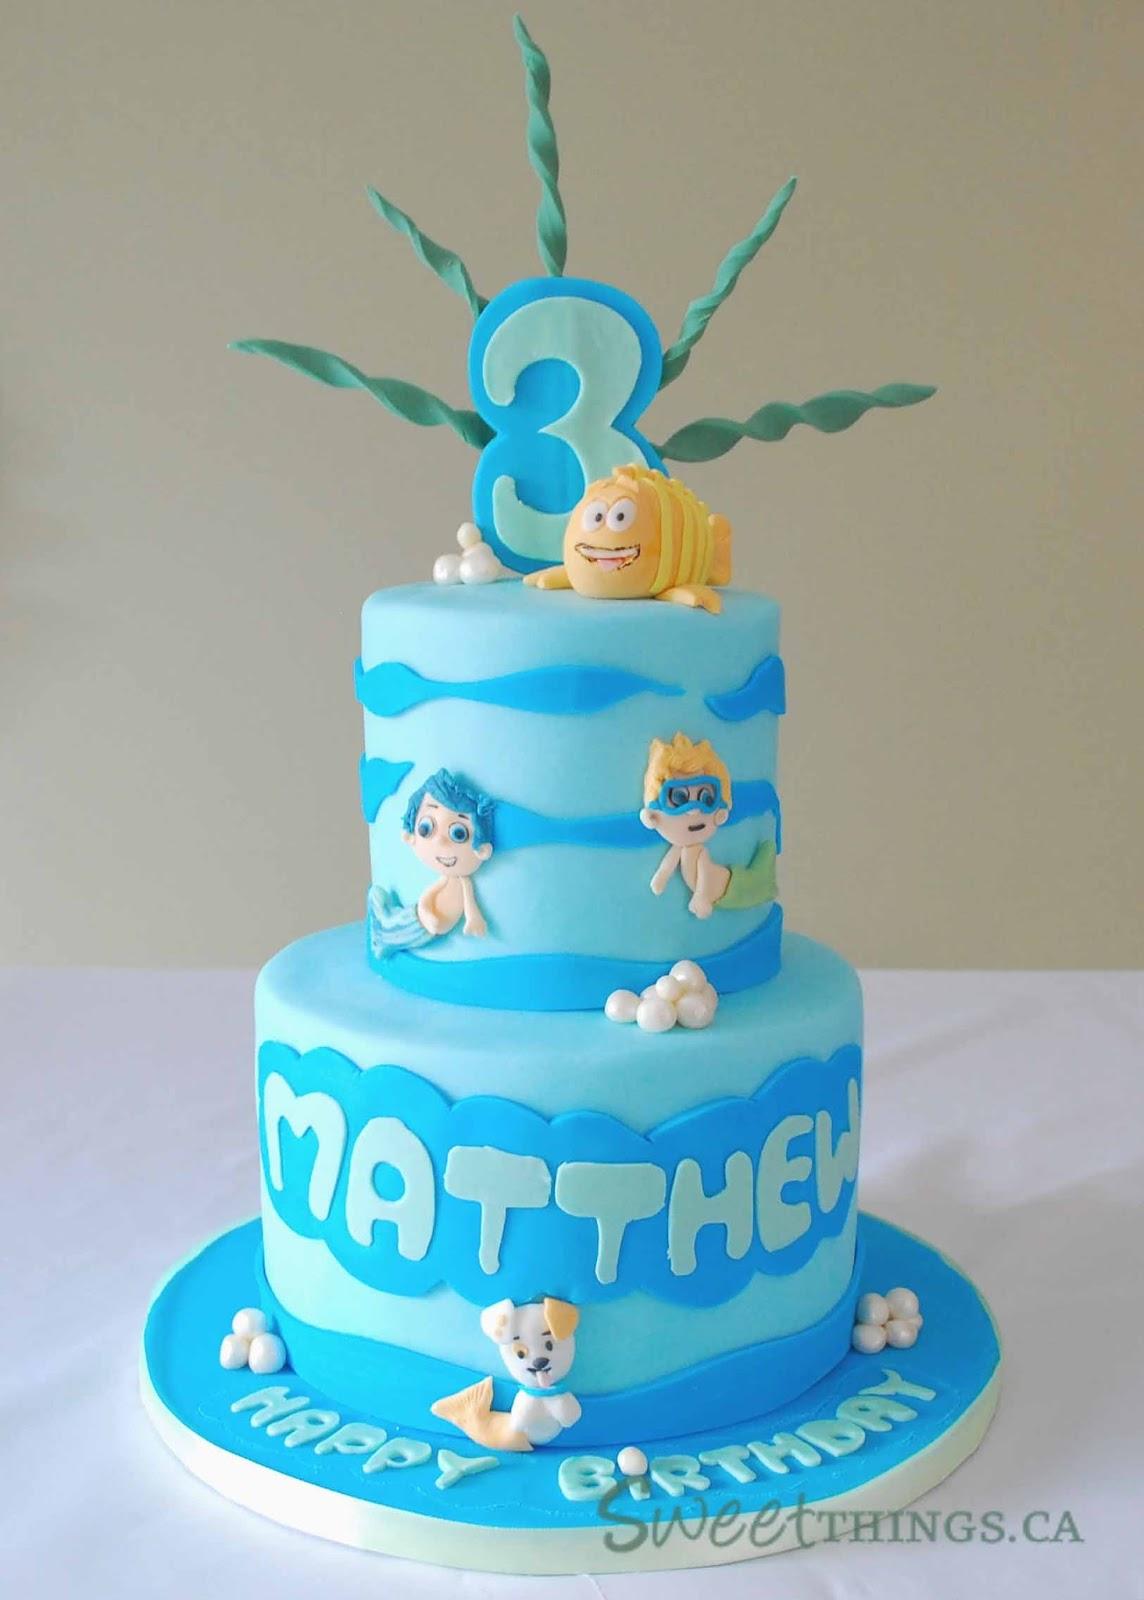 Sweetthings Bubble Guppies Cake